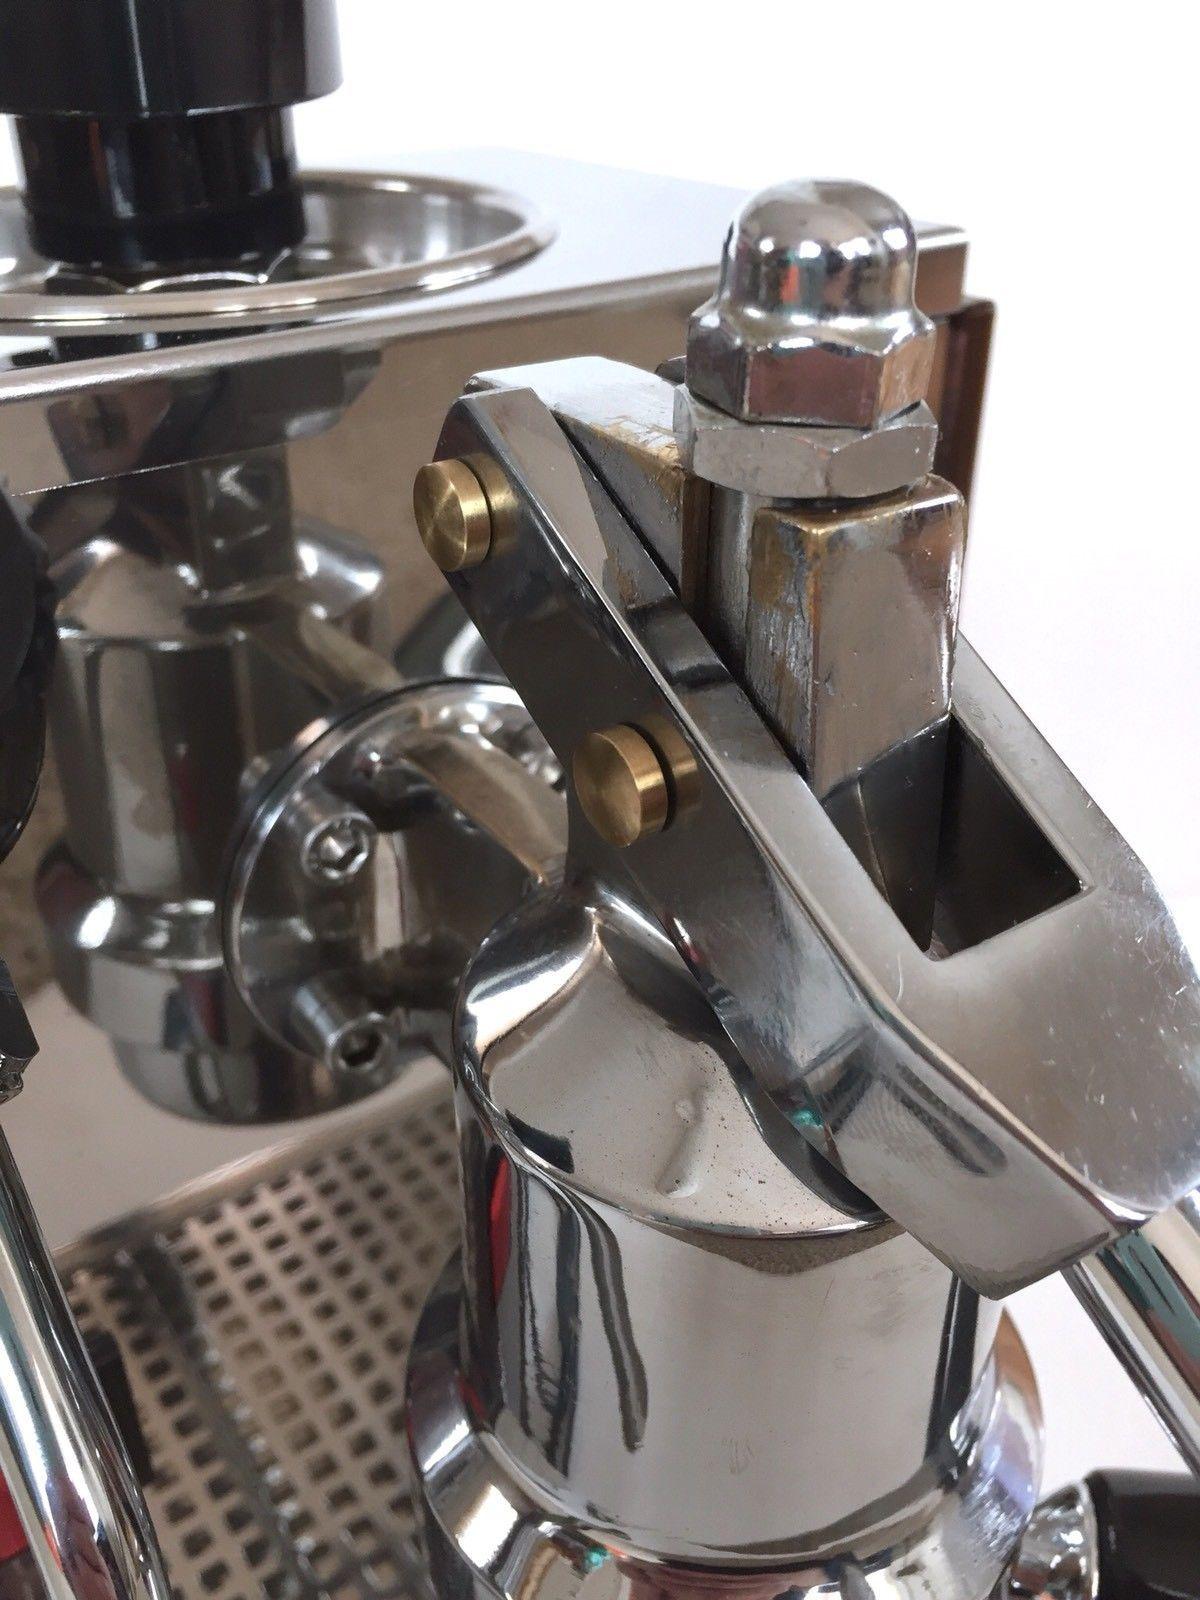 Olympia Express Cremina Vintage Lever Espresso Machine Clean Rebuilt Upgrades Ebay Espresso Machines Espresso Coffee Machine Espresso Machine